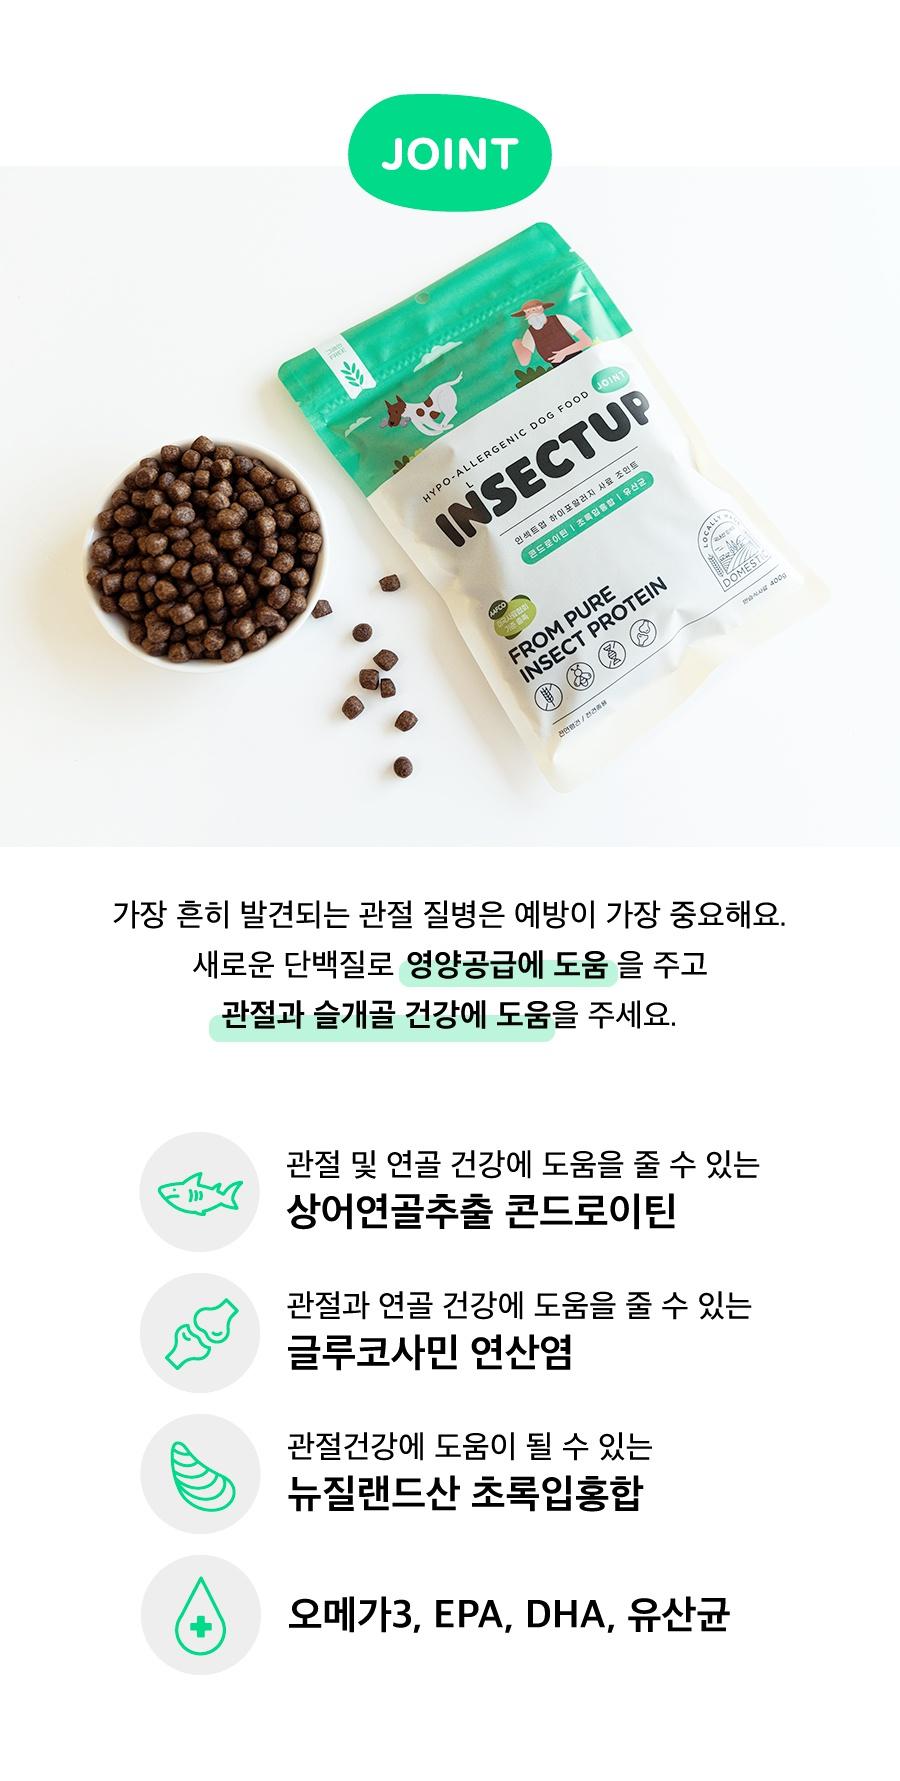 [EVENT] 인섹트업 맛보기 샘플팩 (40g*6팩)-상품이미지-13